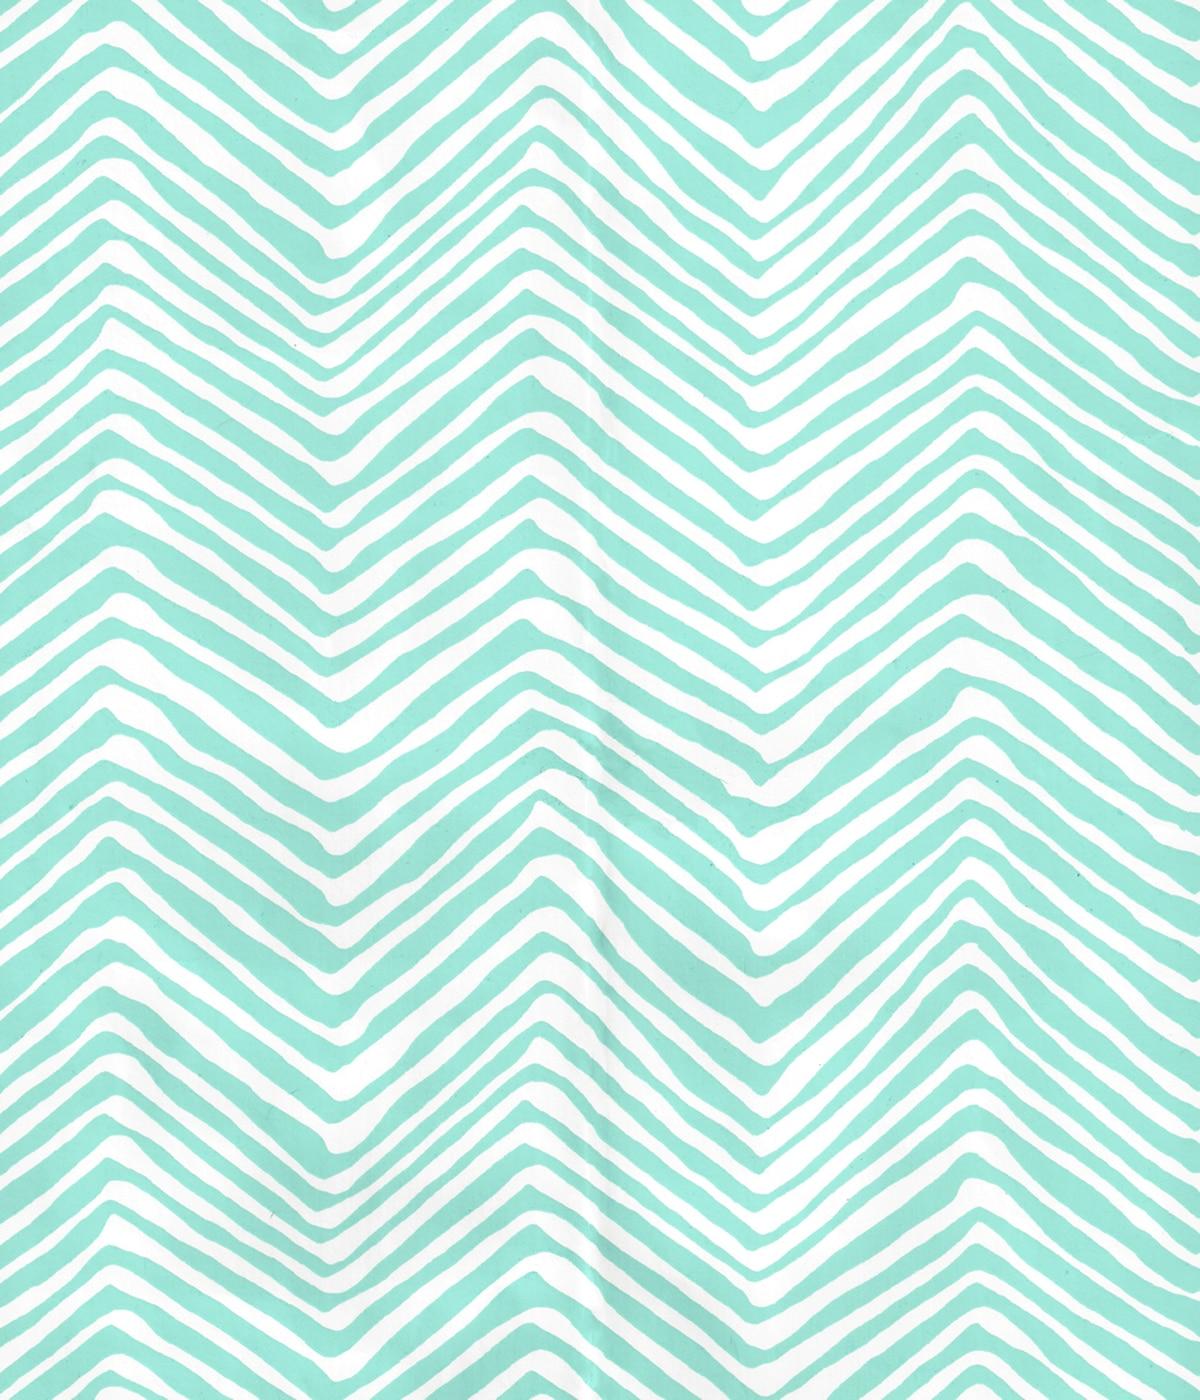 Quadrille Petite Zig Zag Wallpaper 1000x1167